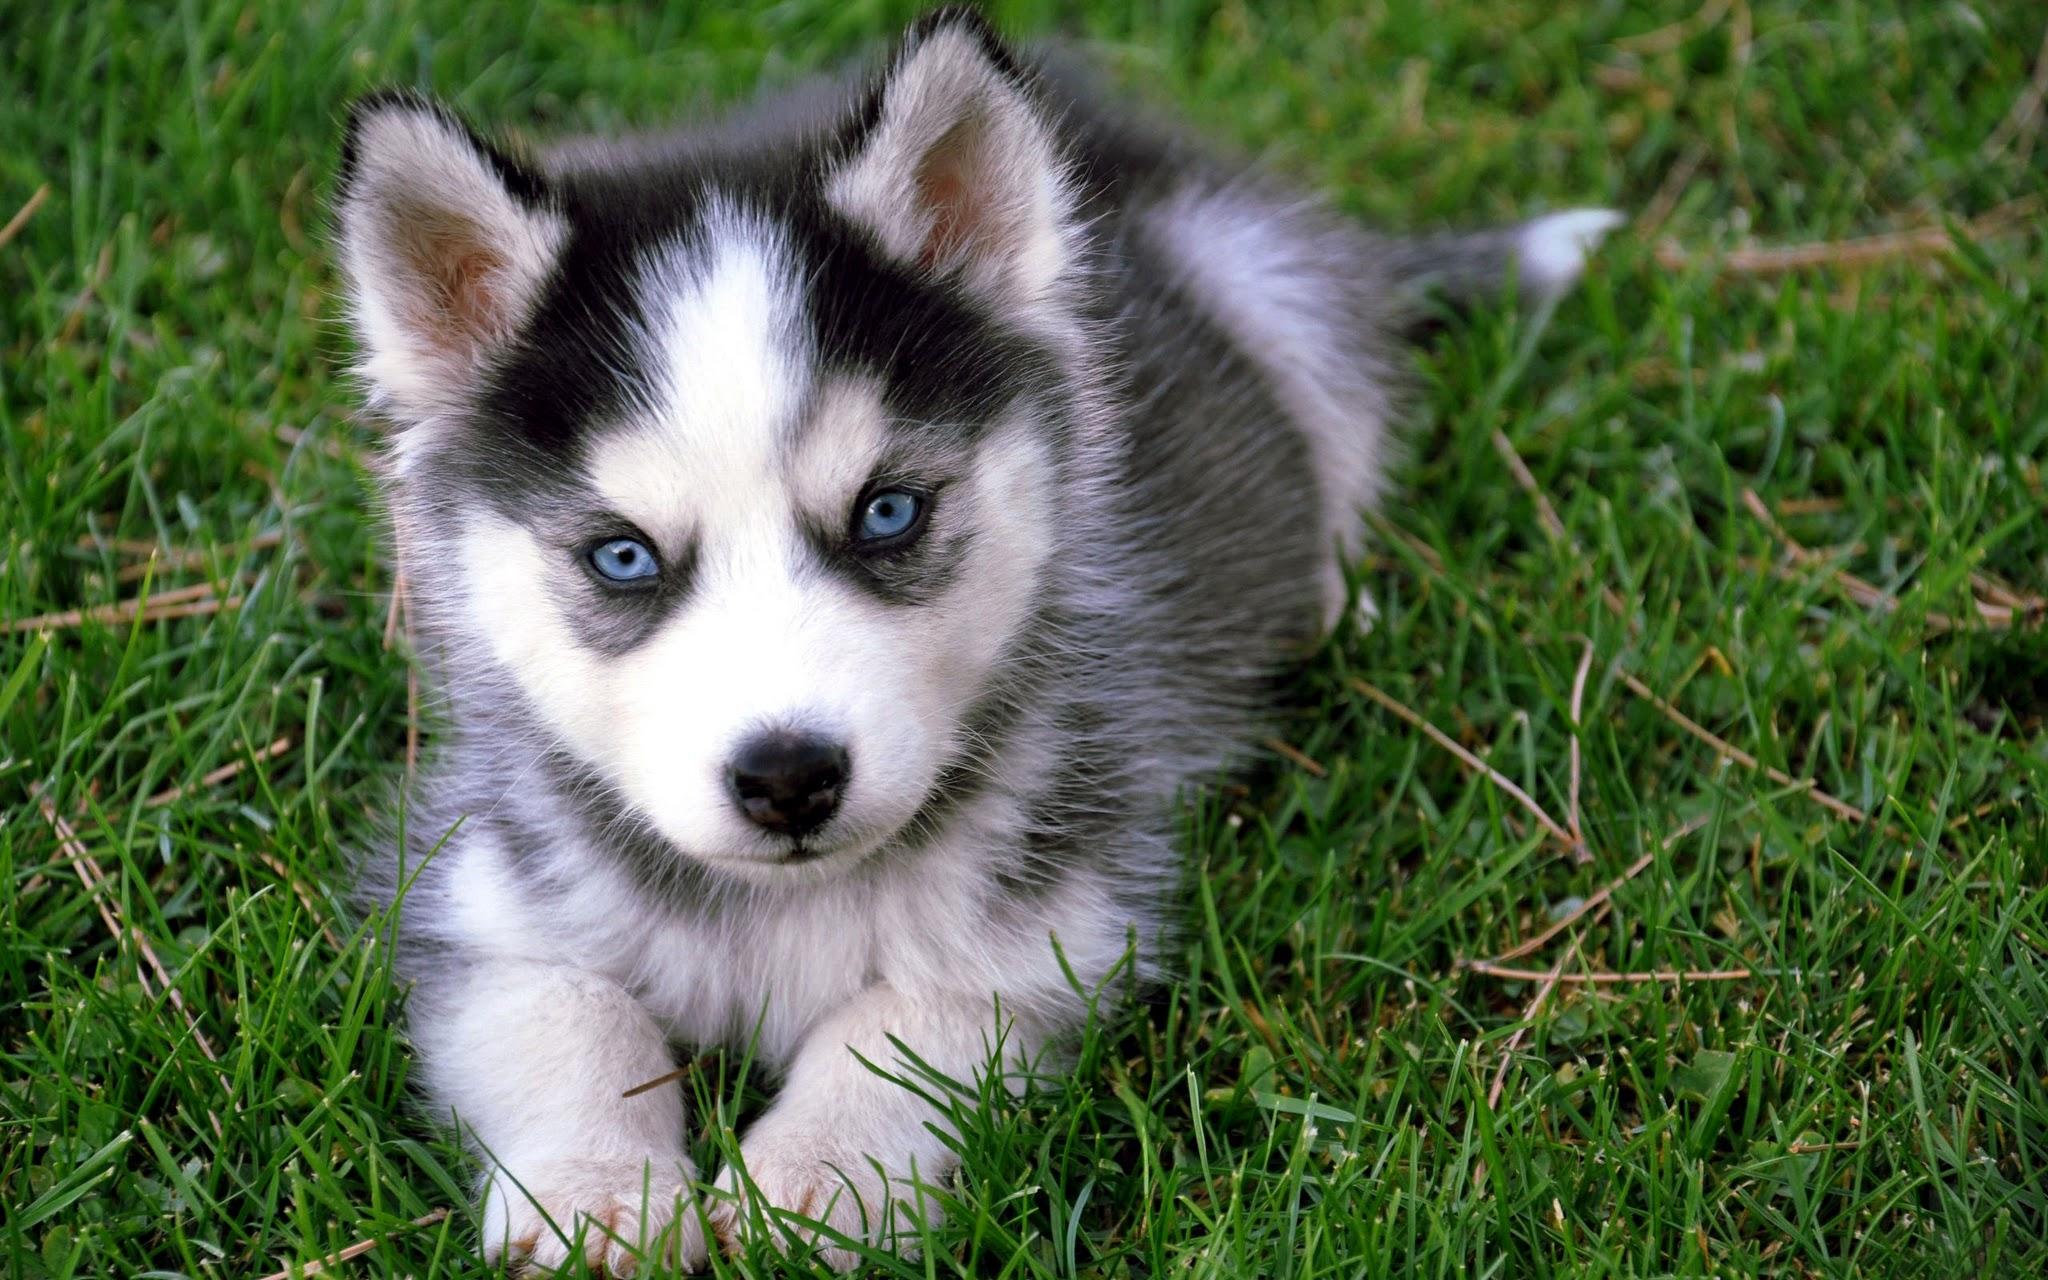 Cute Puppy Dog in Grass Full HD Wallpaper Hd Wallpaper 2048x1280